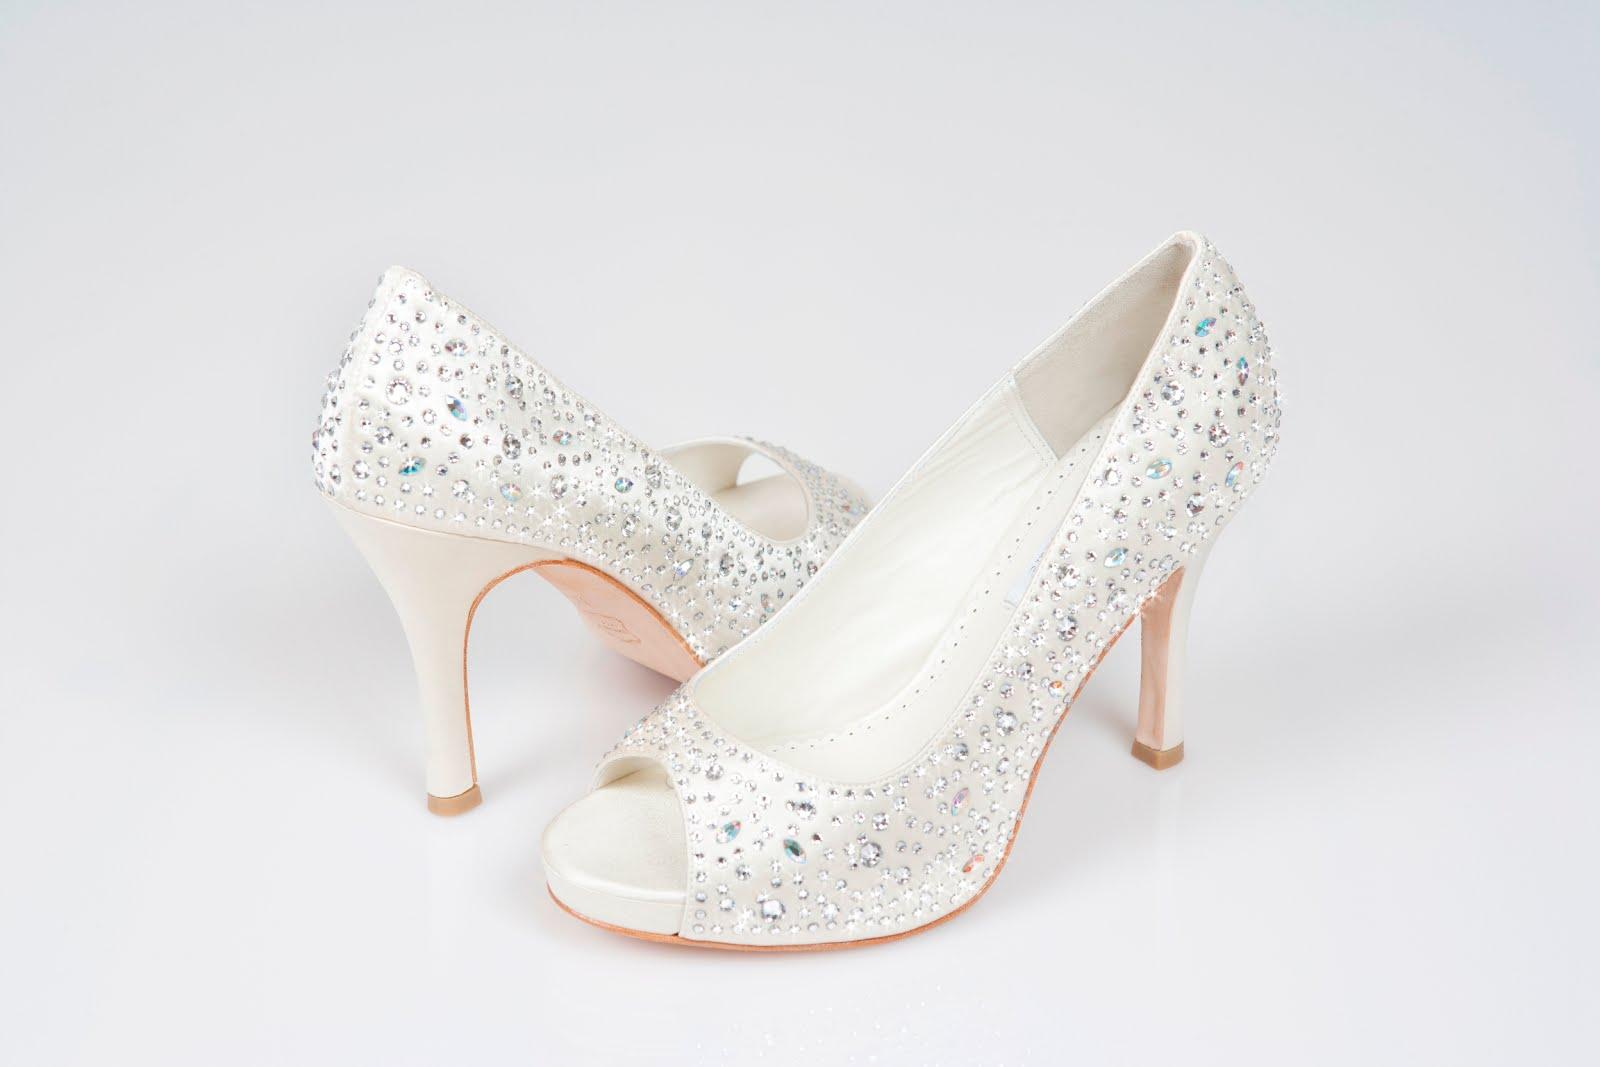 Wedding dresses luxury wedding shoes for Heels for wedding dress